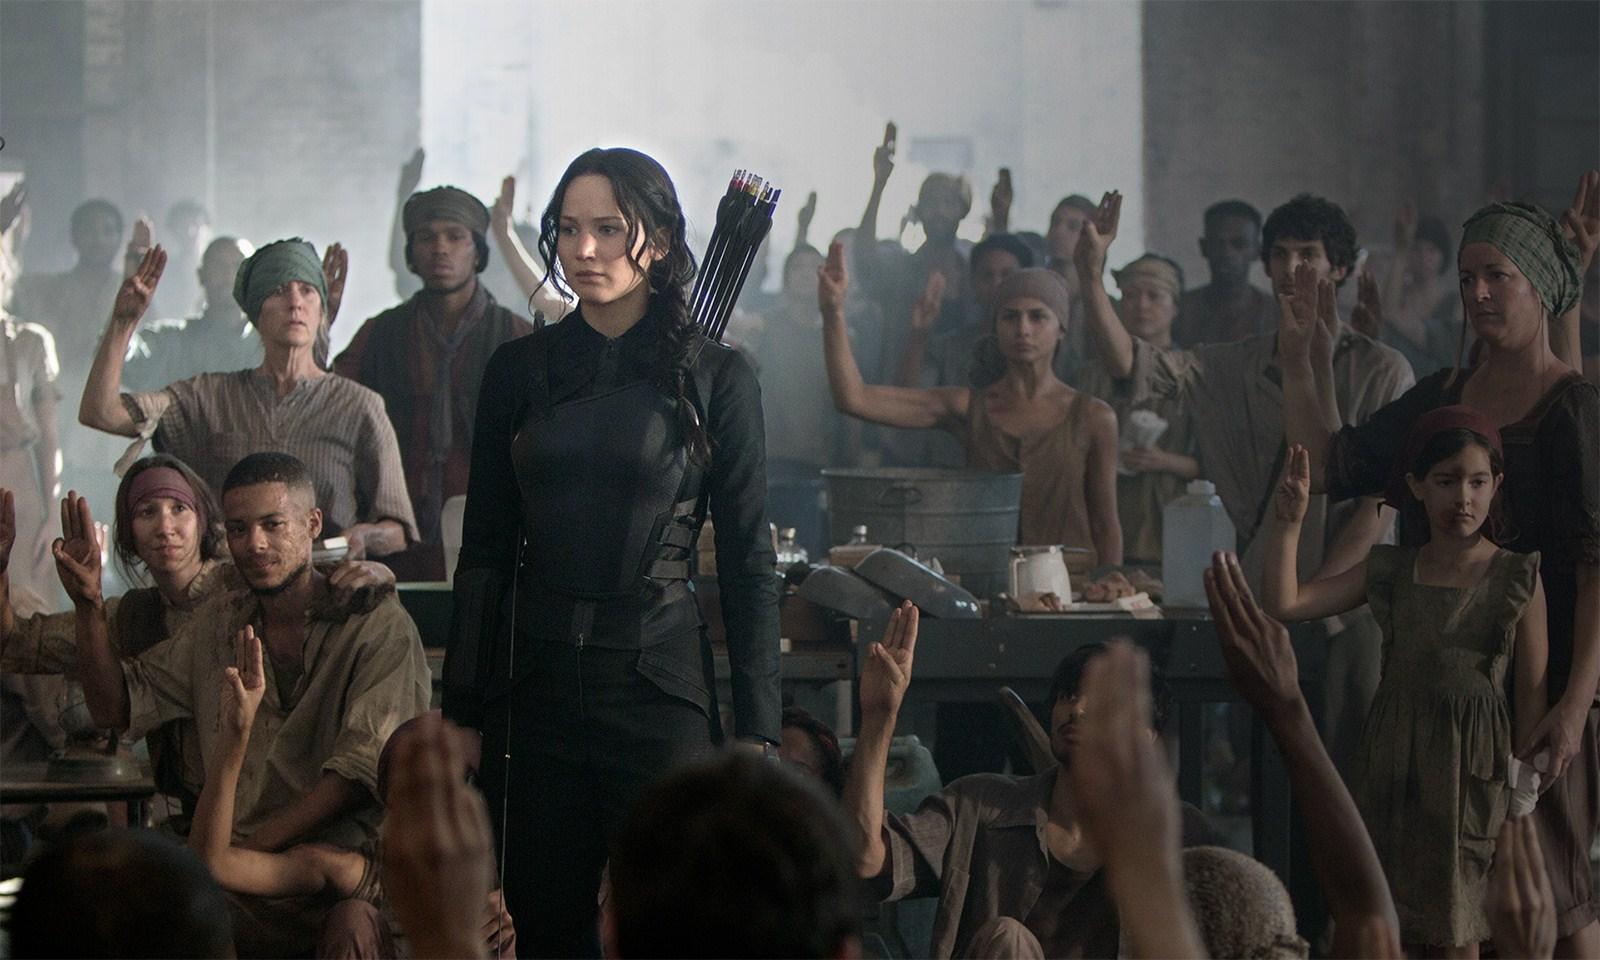 Jennifer-Lawrence-In-The-Hunger-Games-Mockingjay-Part-1-Images